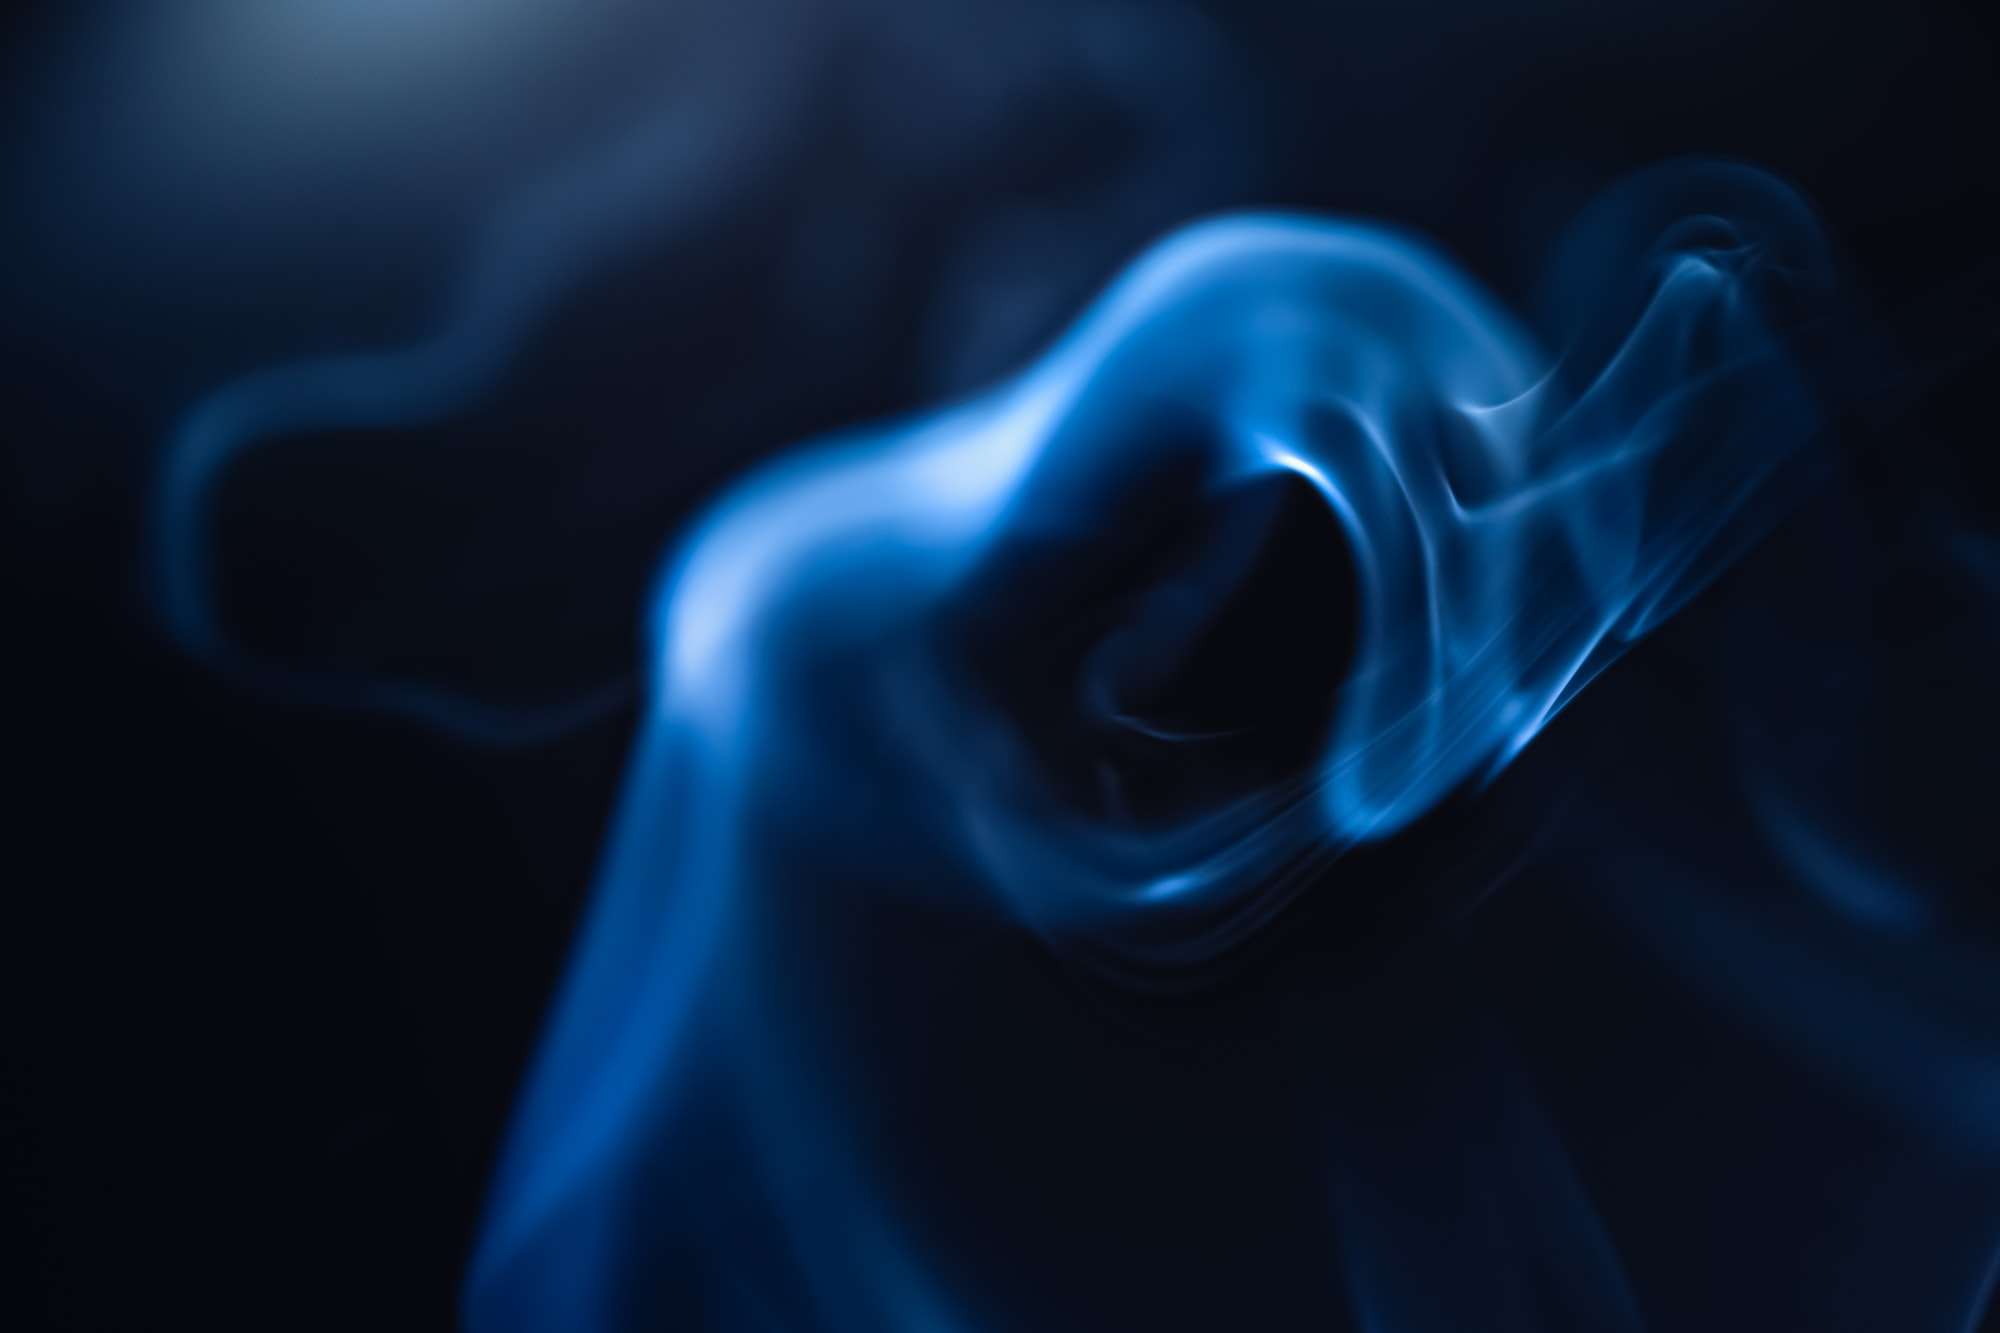 Ghostly hand made of smoke